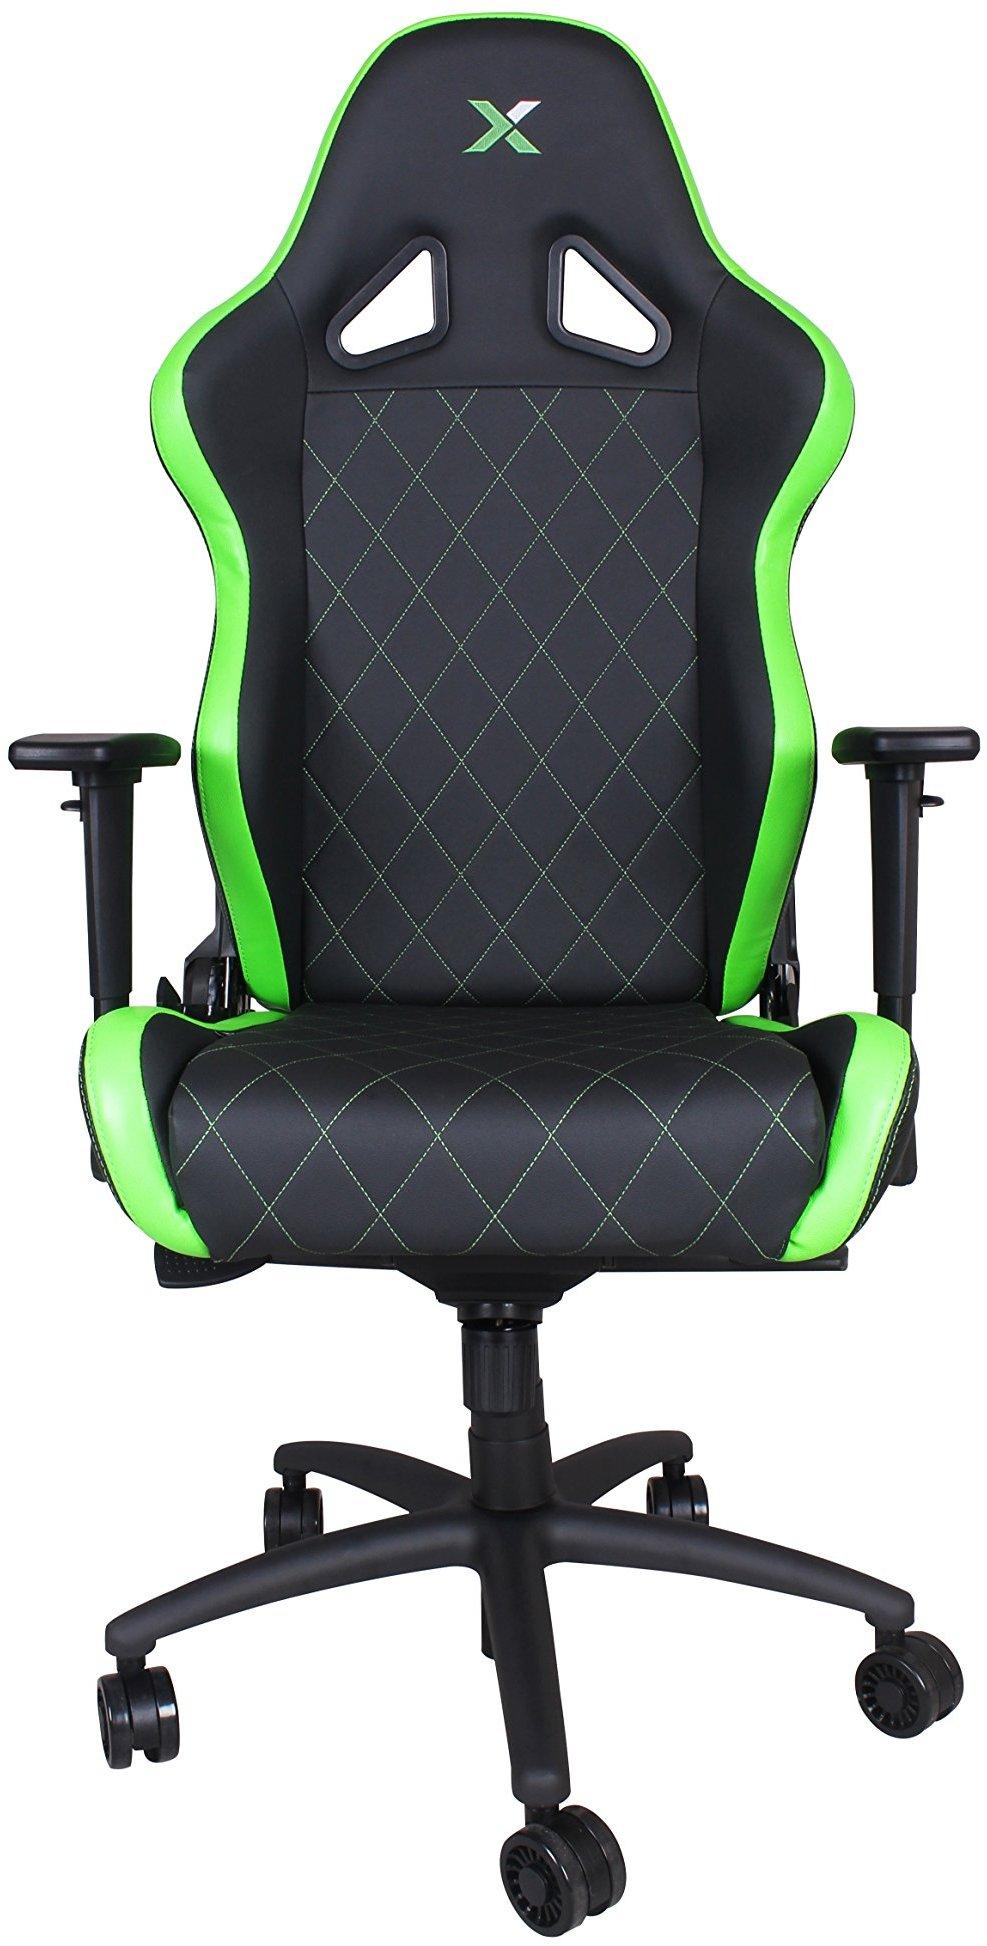 RapidX Finish Line Gaming Chair - $149.99 Free Shipping